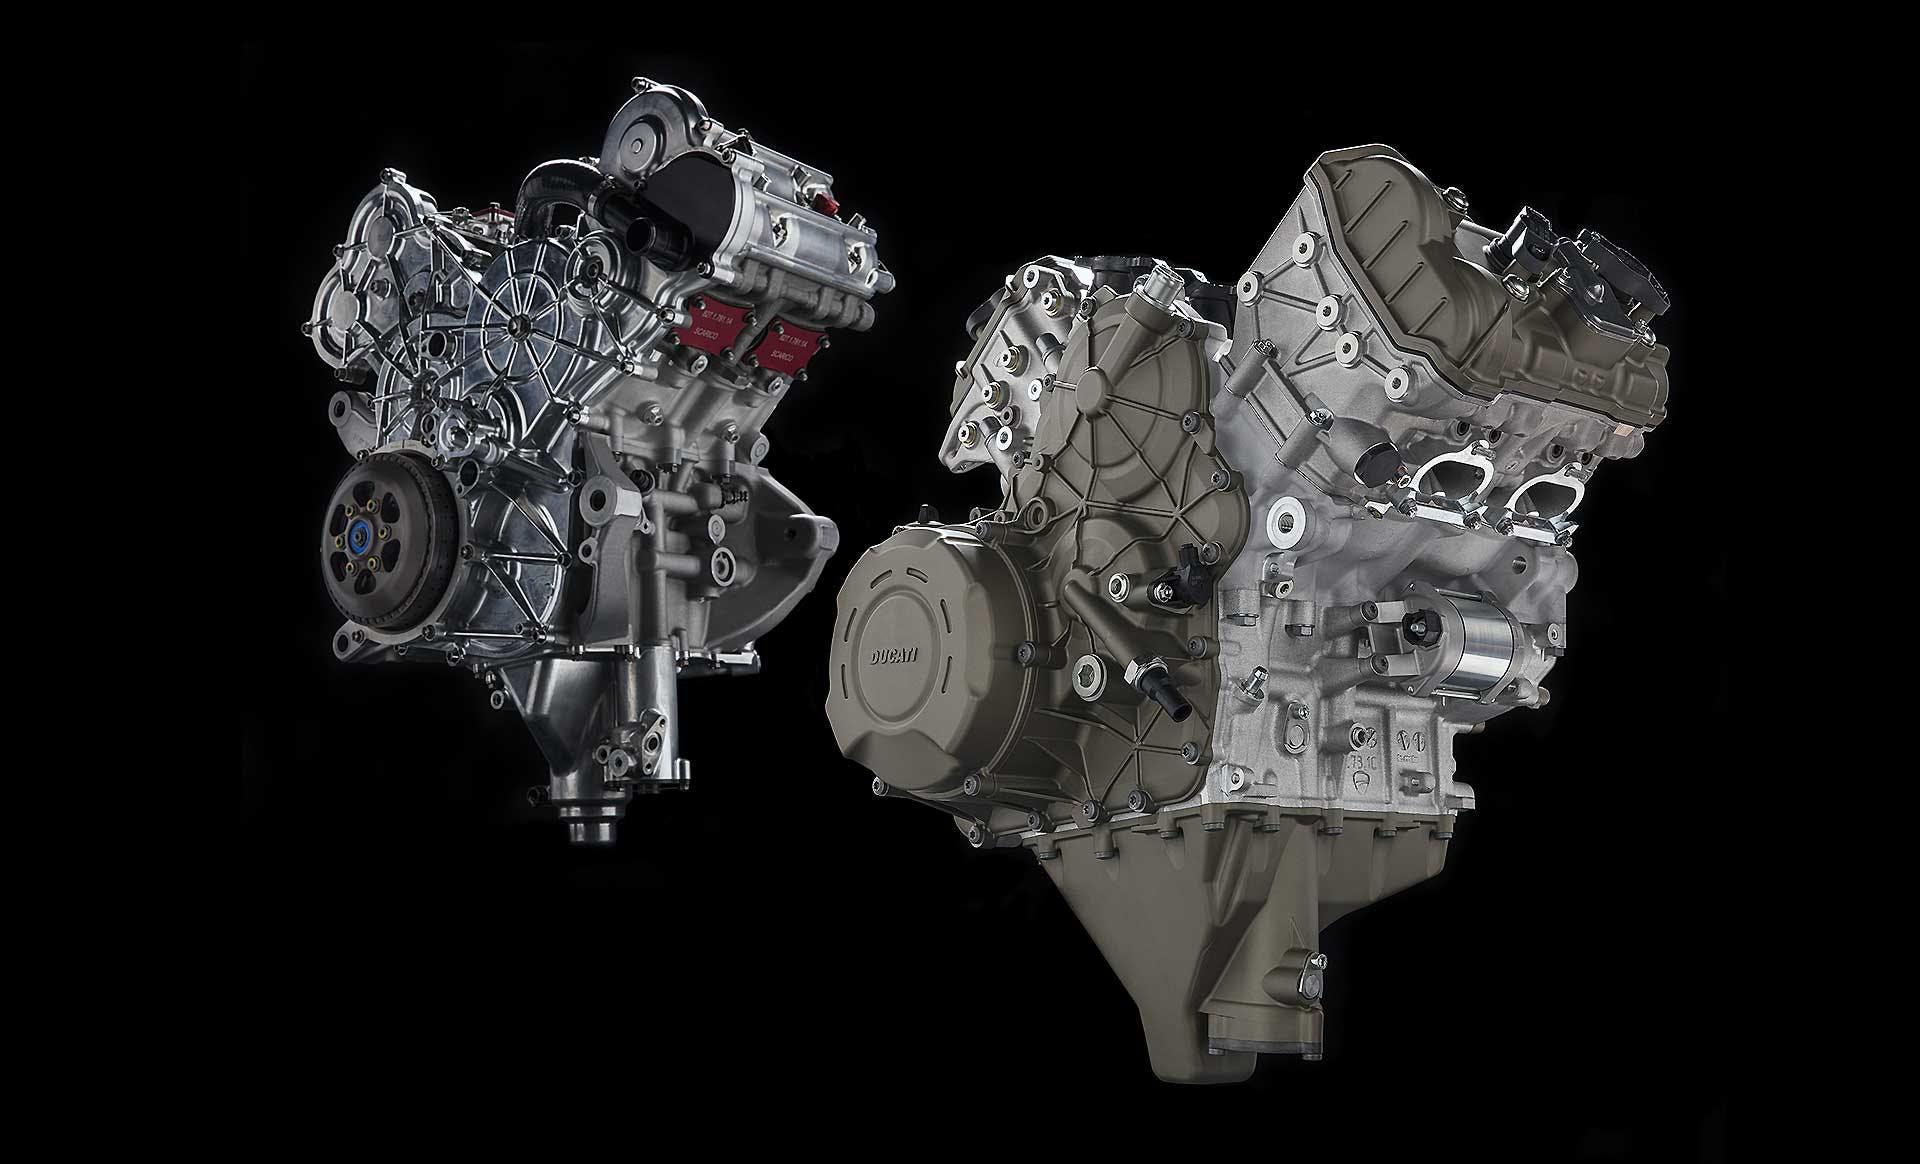 Motore Ducati Desmosedici Stradale